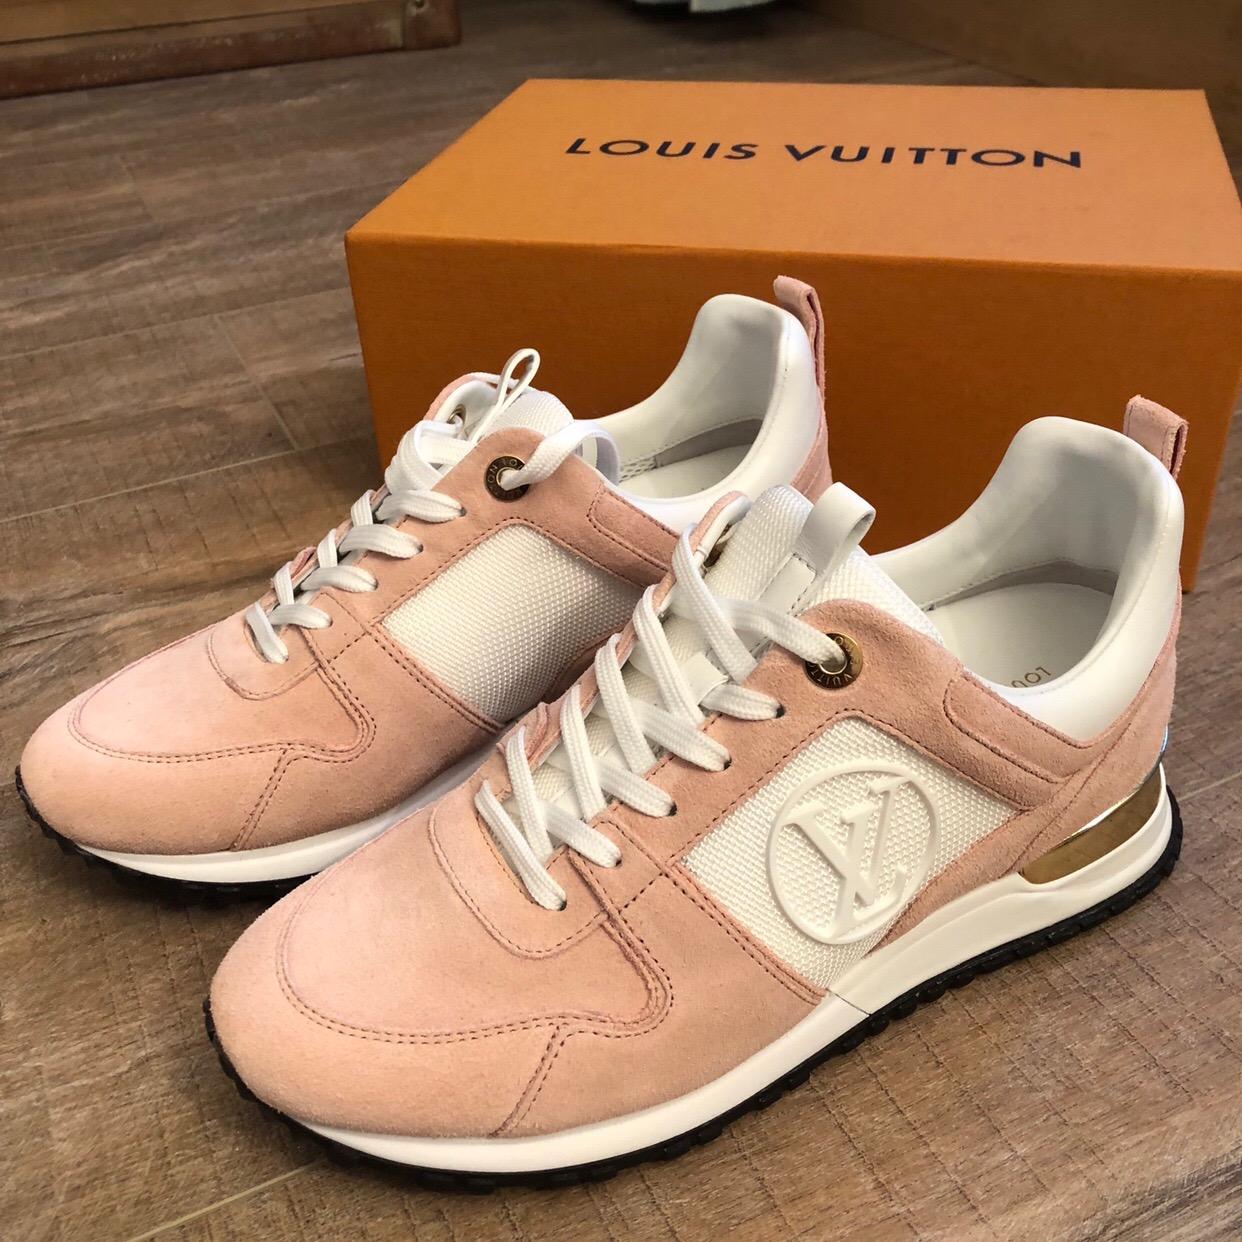 Louis Vuitton Pink Suede Run Away